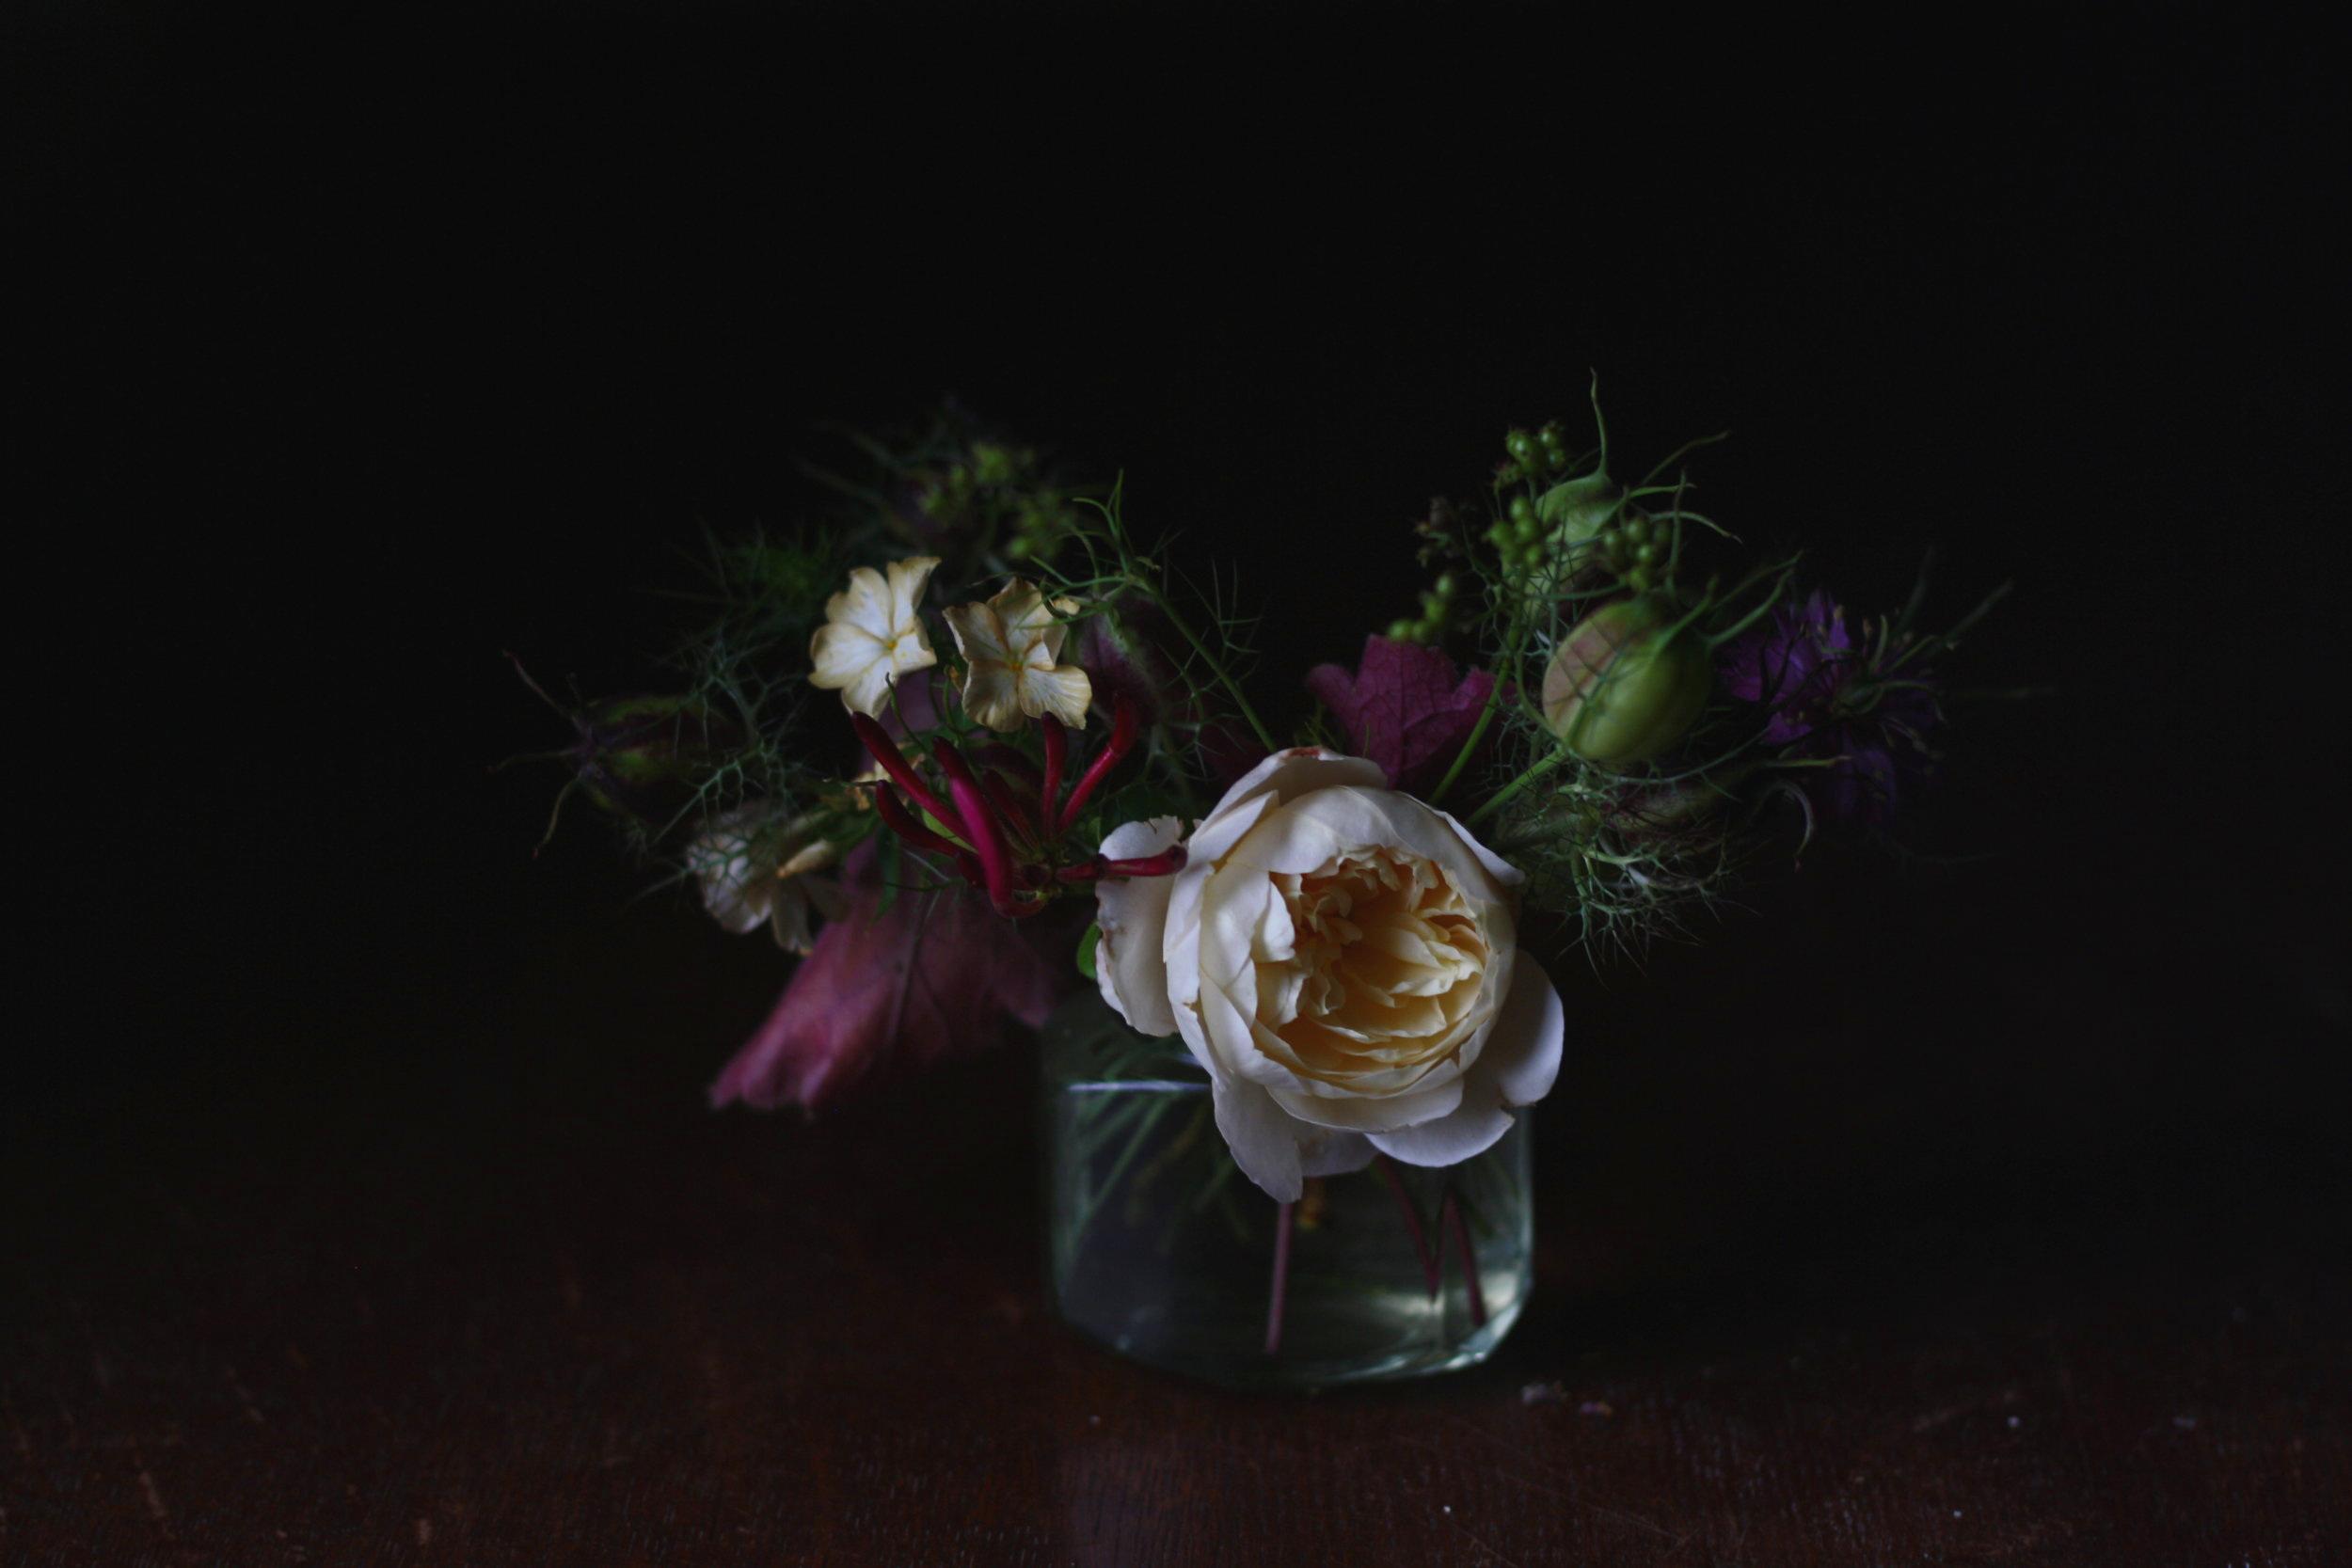 DA 'Crocus' rose, heuchera, Phlox 'Cremee Brulee' and Nigella seed pod.